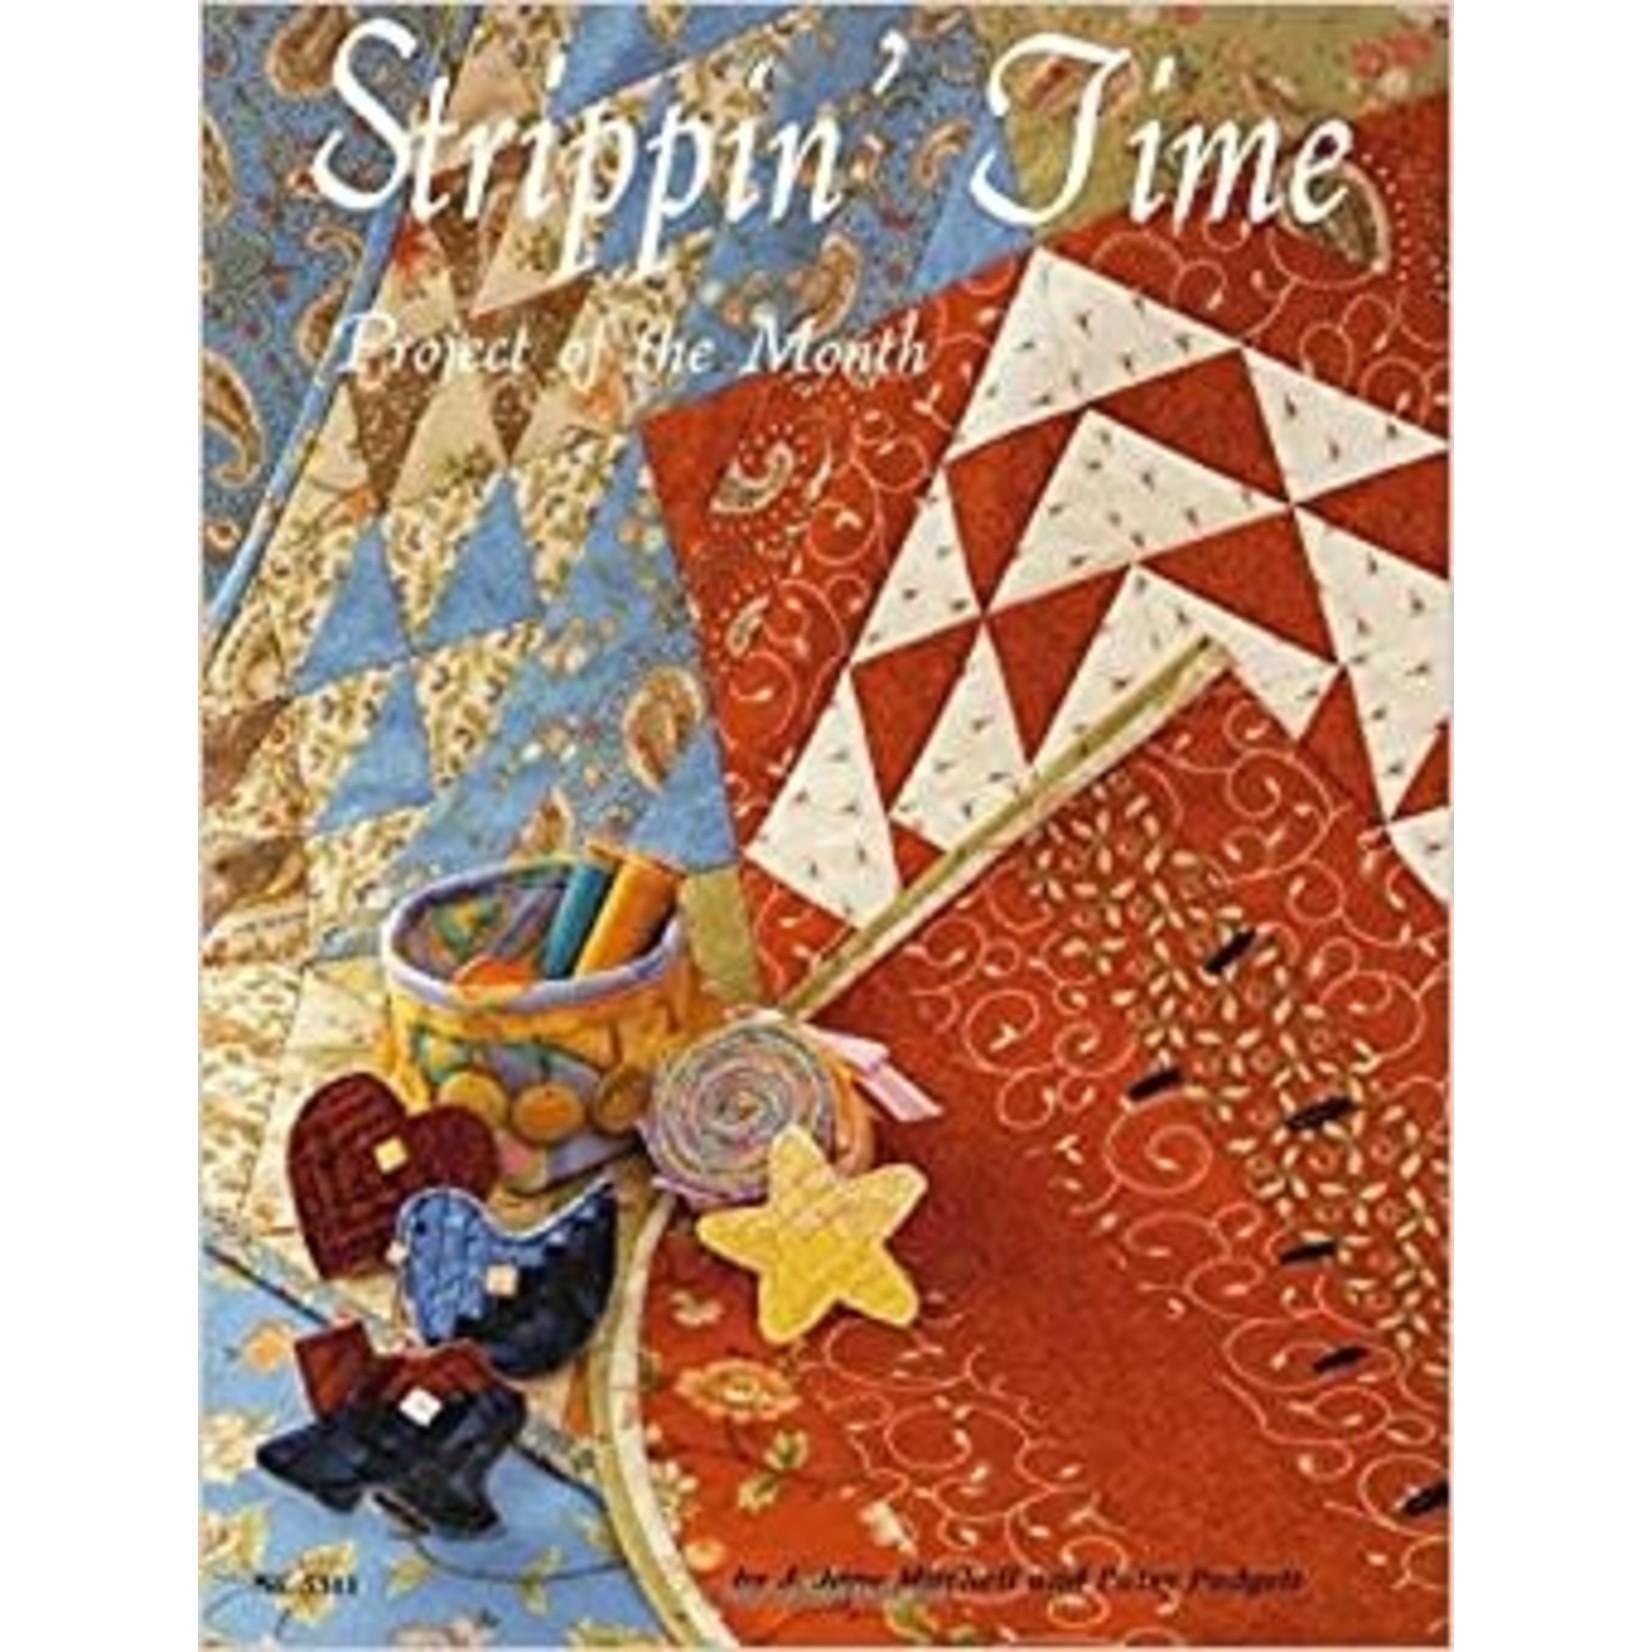 STRIPPIN' TIME BOOK